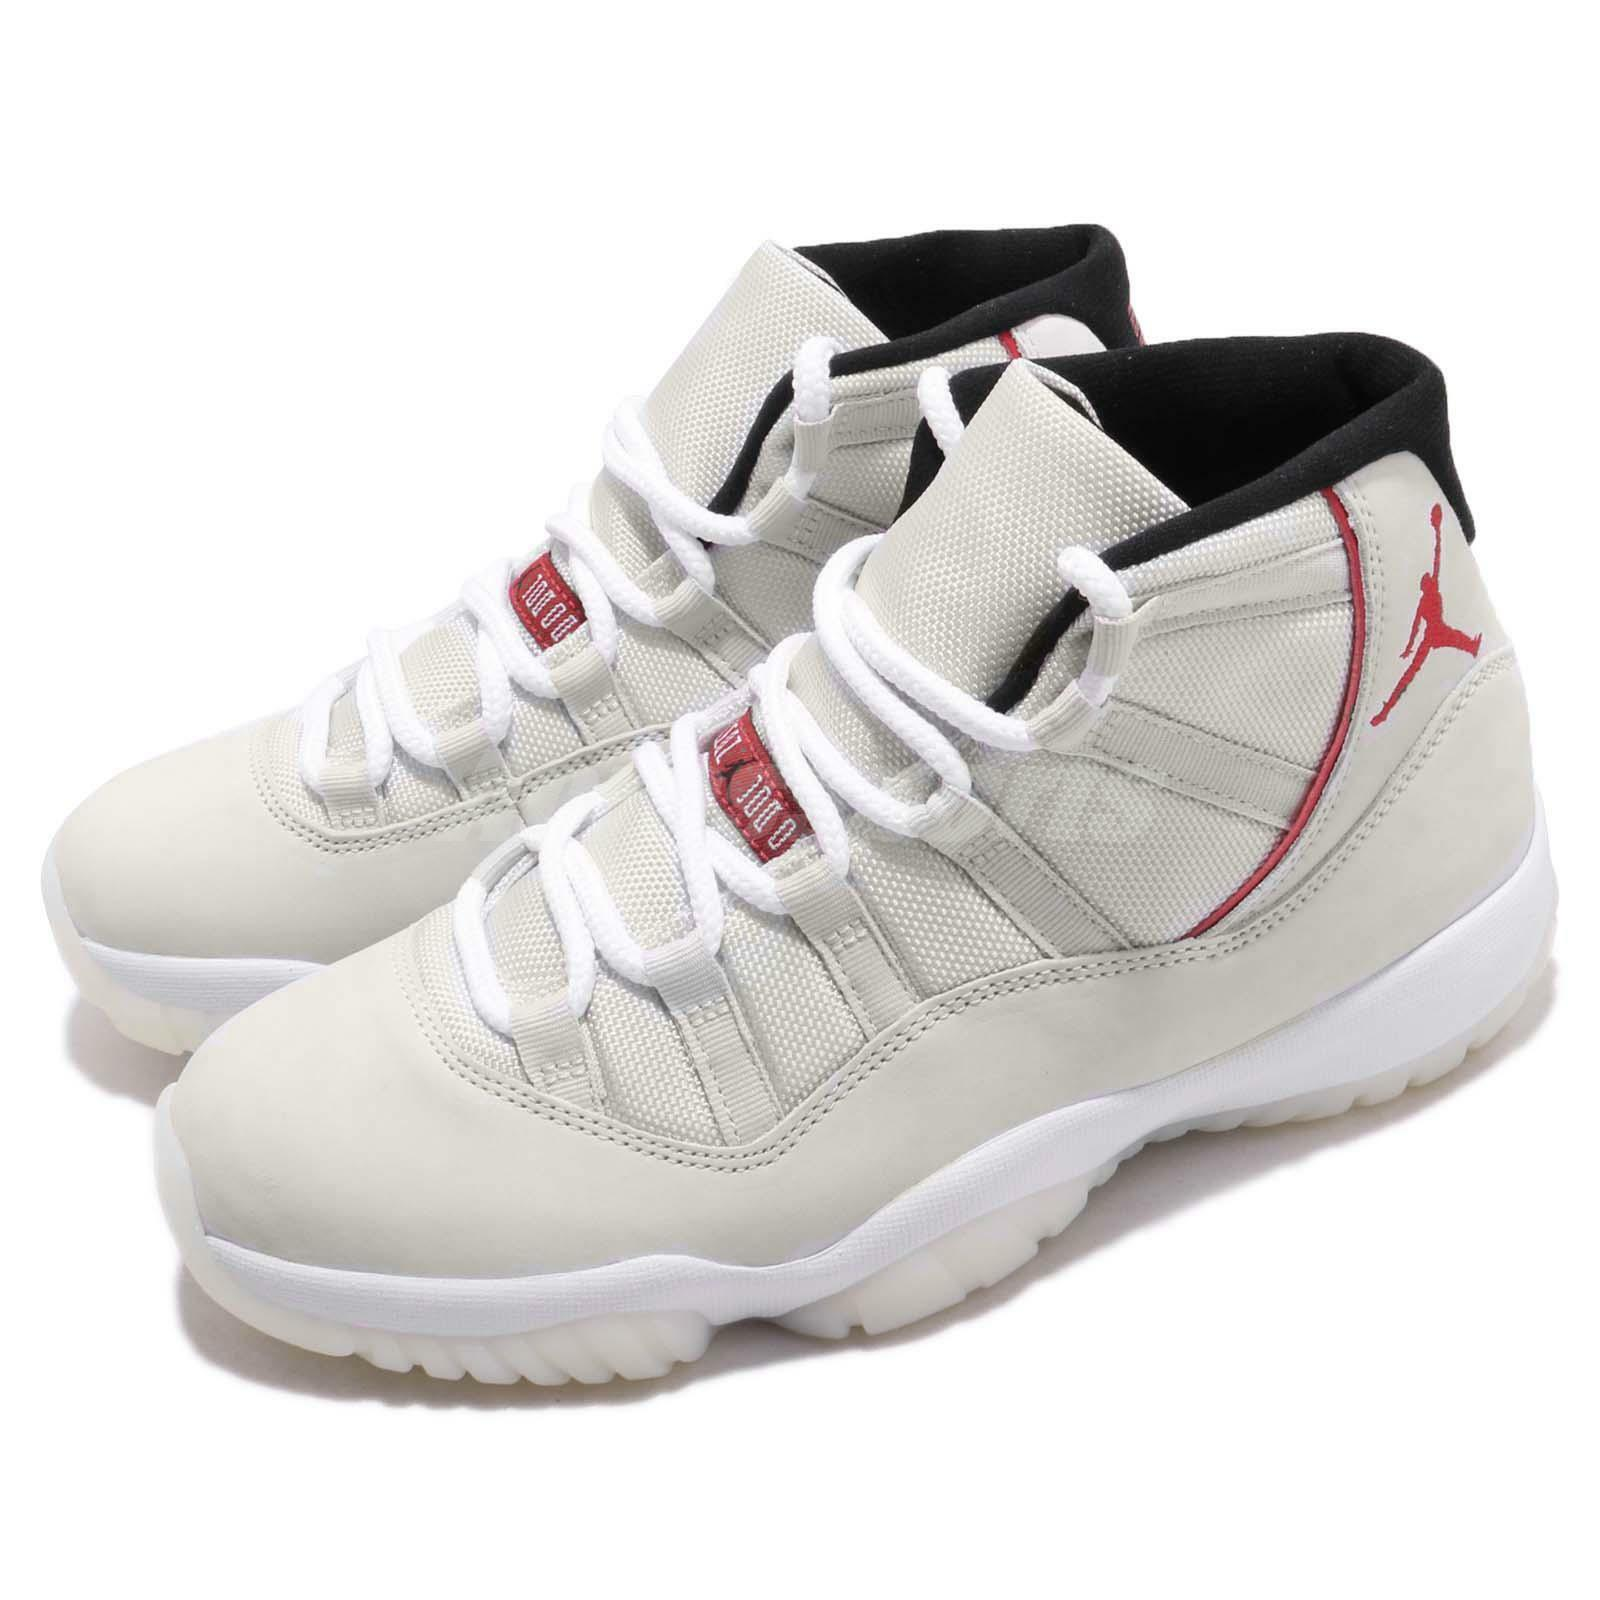 Nike Air Jordan 11 Retro Platinum Tint Sail University Red XI AJ11 378037-016